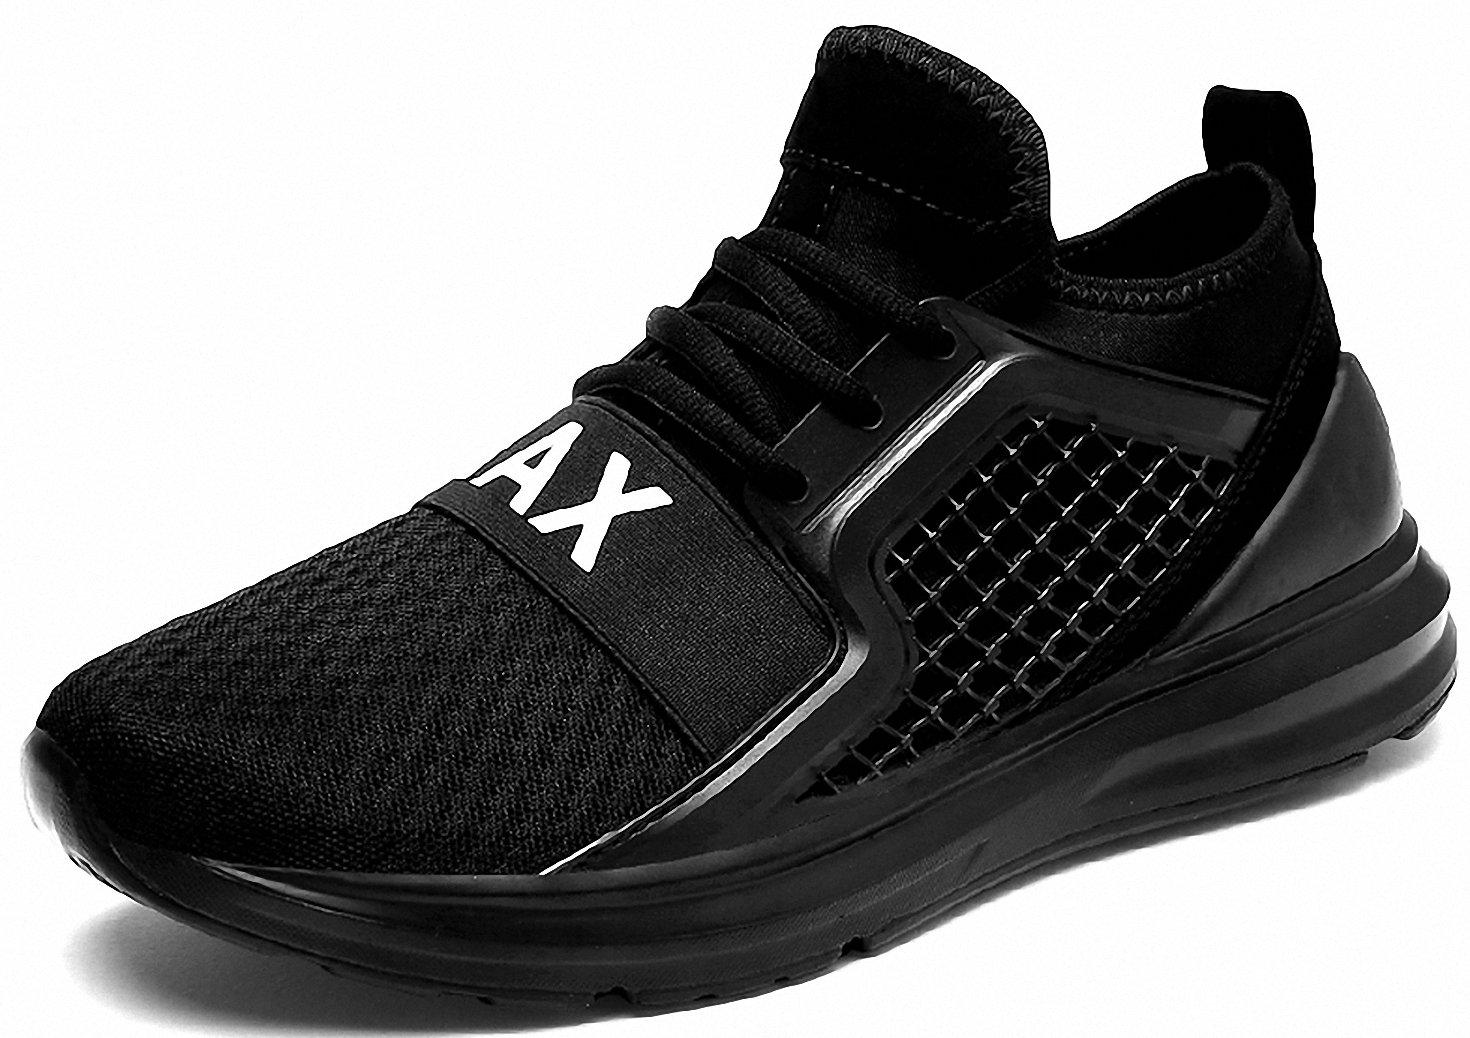 Weweya Men's Road Running Shoes Athletic Training Shoes Casual Walking Sneakers B07DNWDZ31 6 M US|Black